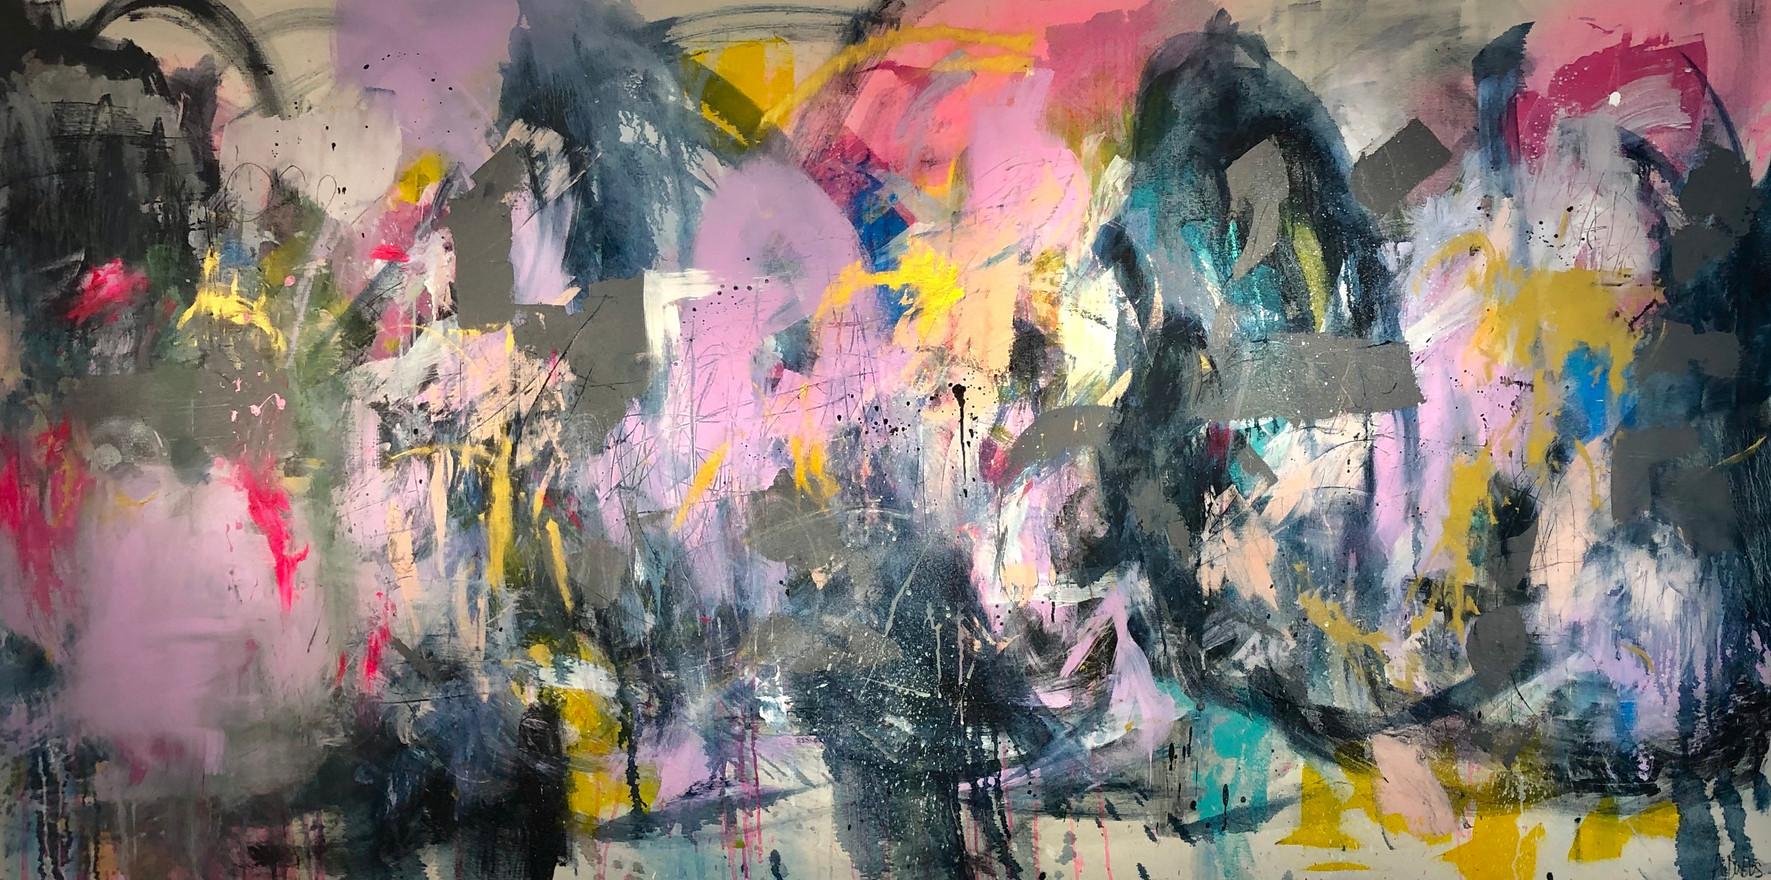 Alyssa Dabbs (b.1998). Bella. Acrylic, oil and ink on canvas, 120 x 240 cm.